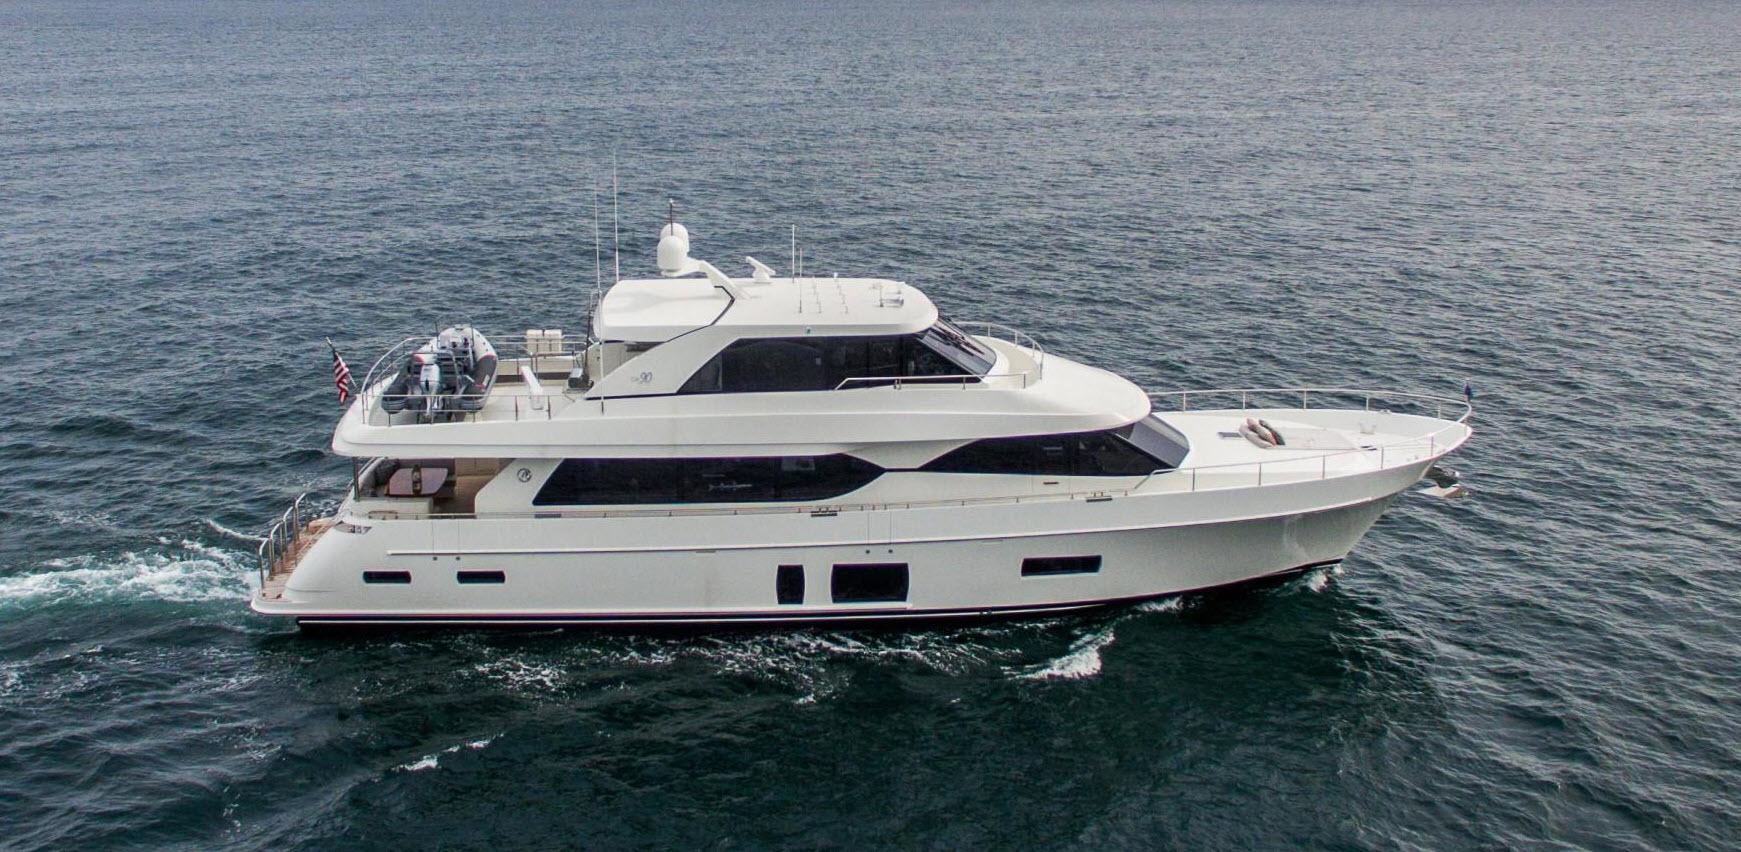 Used_OceanAlexander_Yachts_For_Sale_Header1